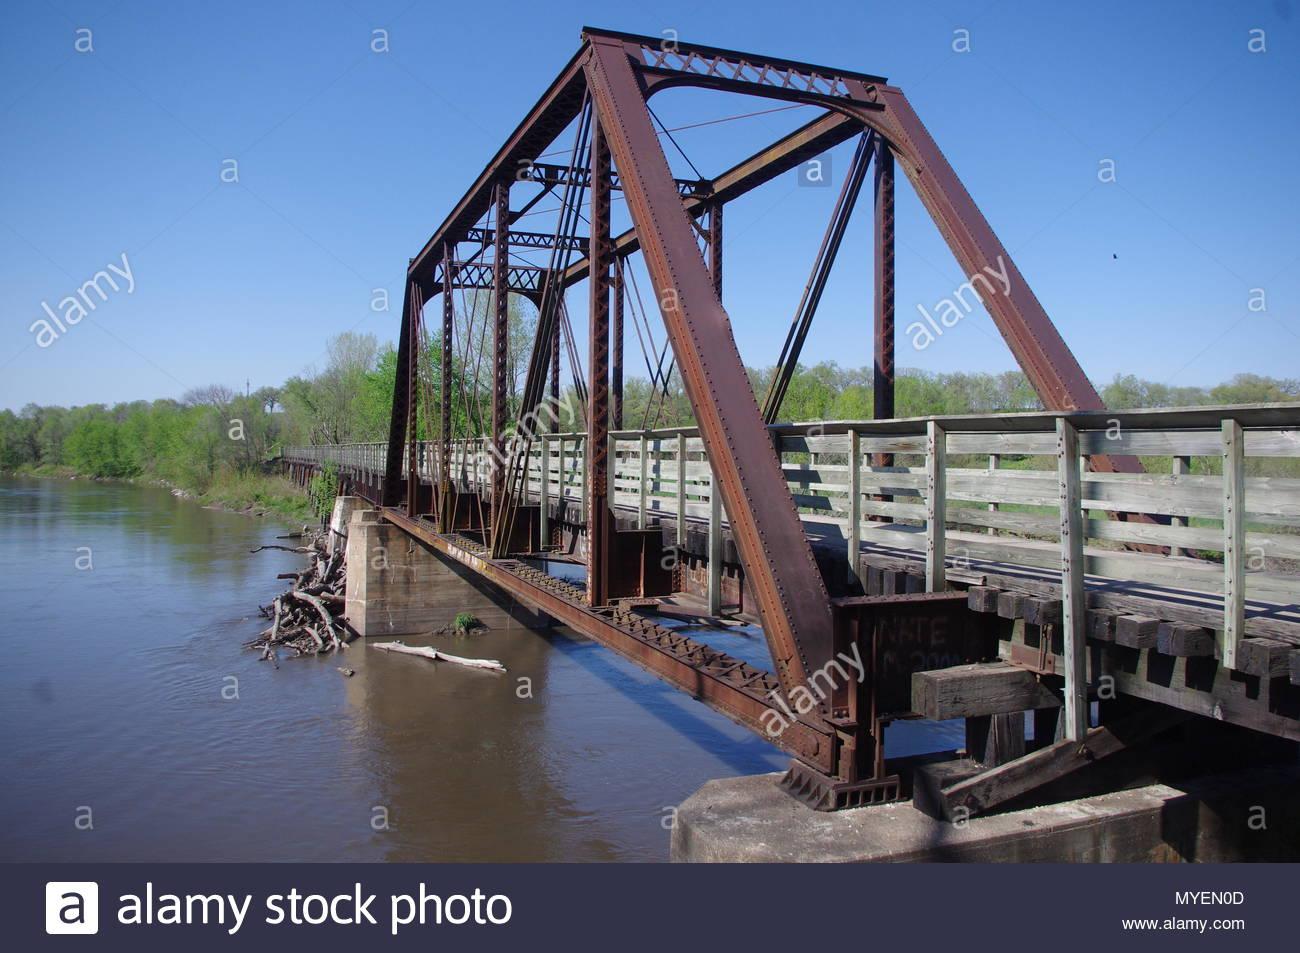 Rails-To-Trails bridge over river - Stock Image